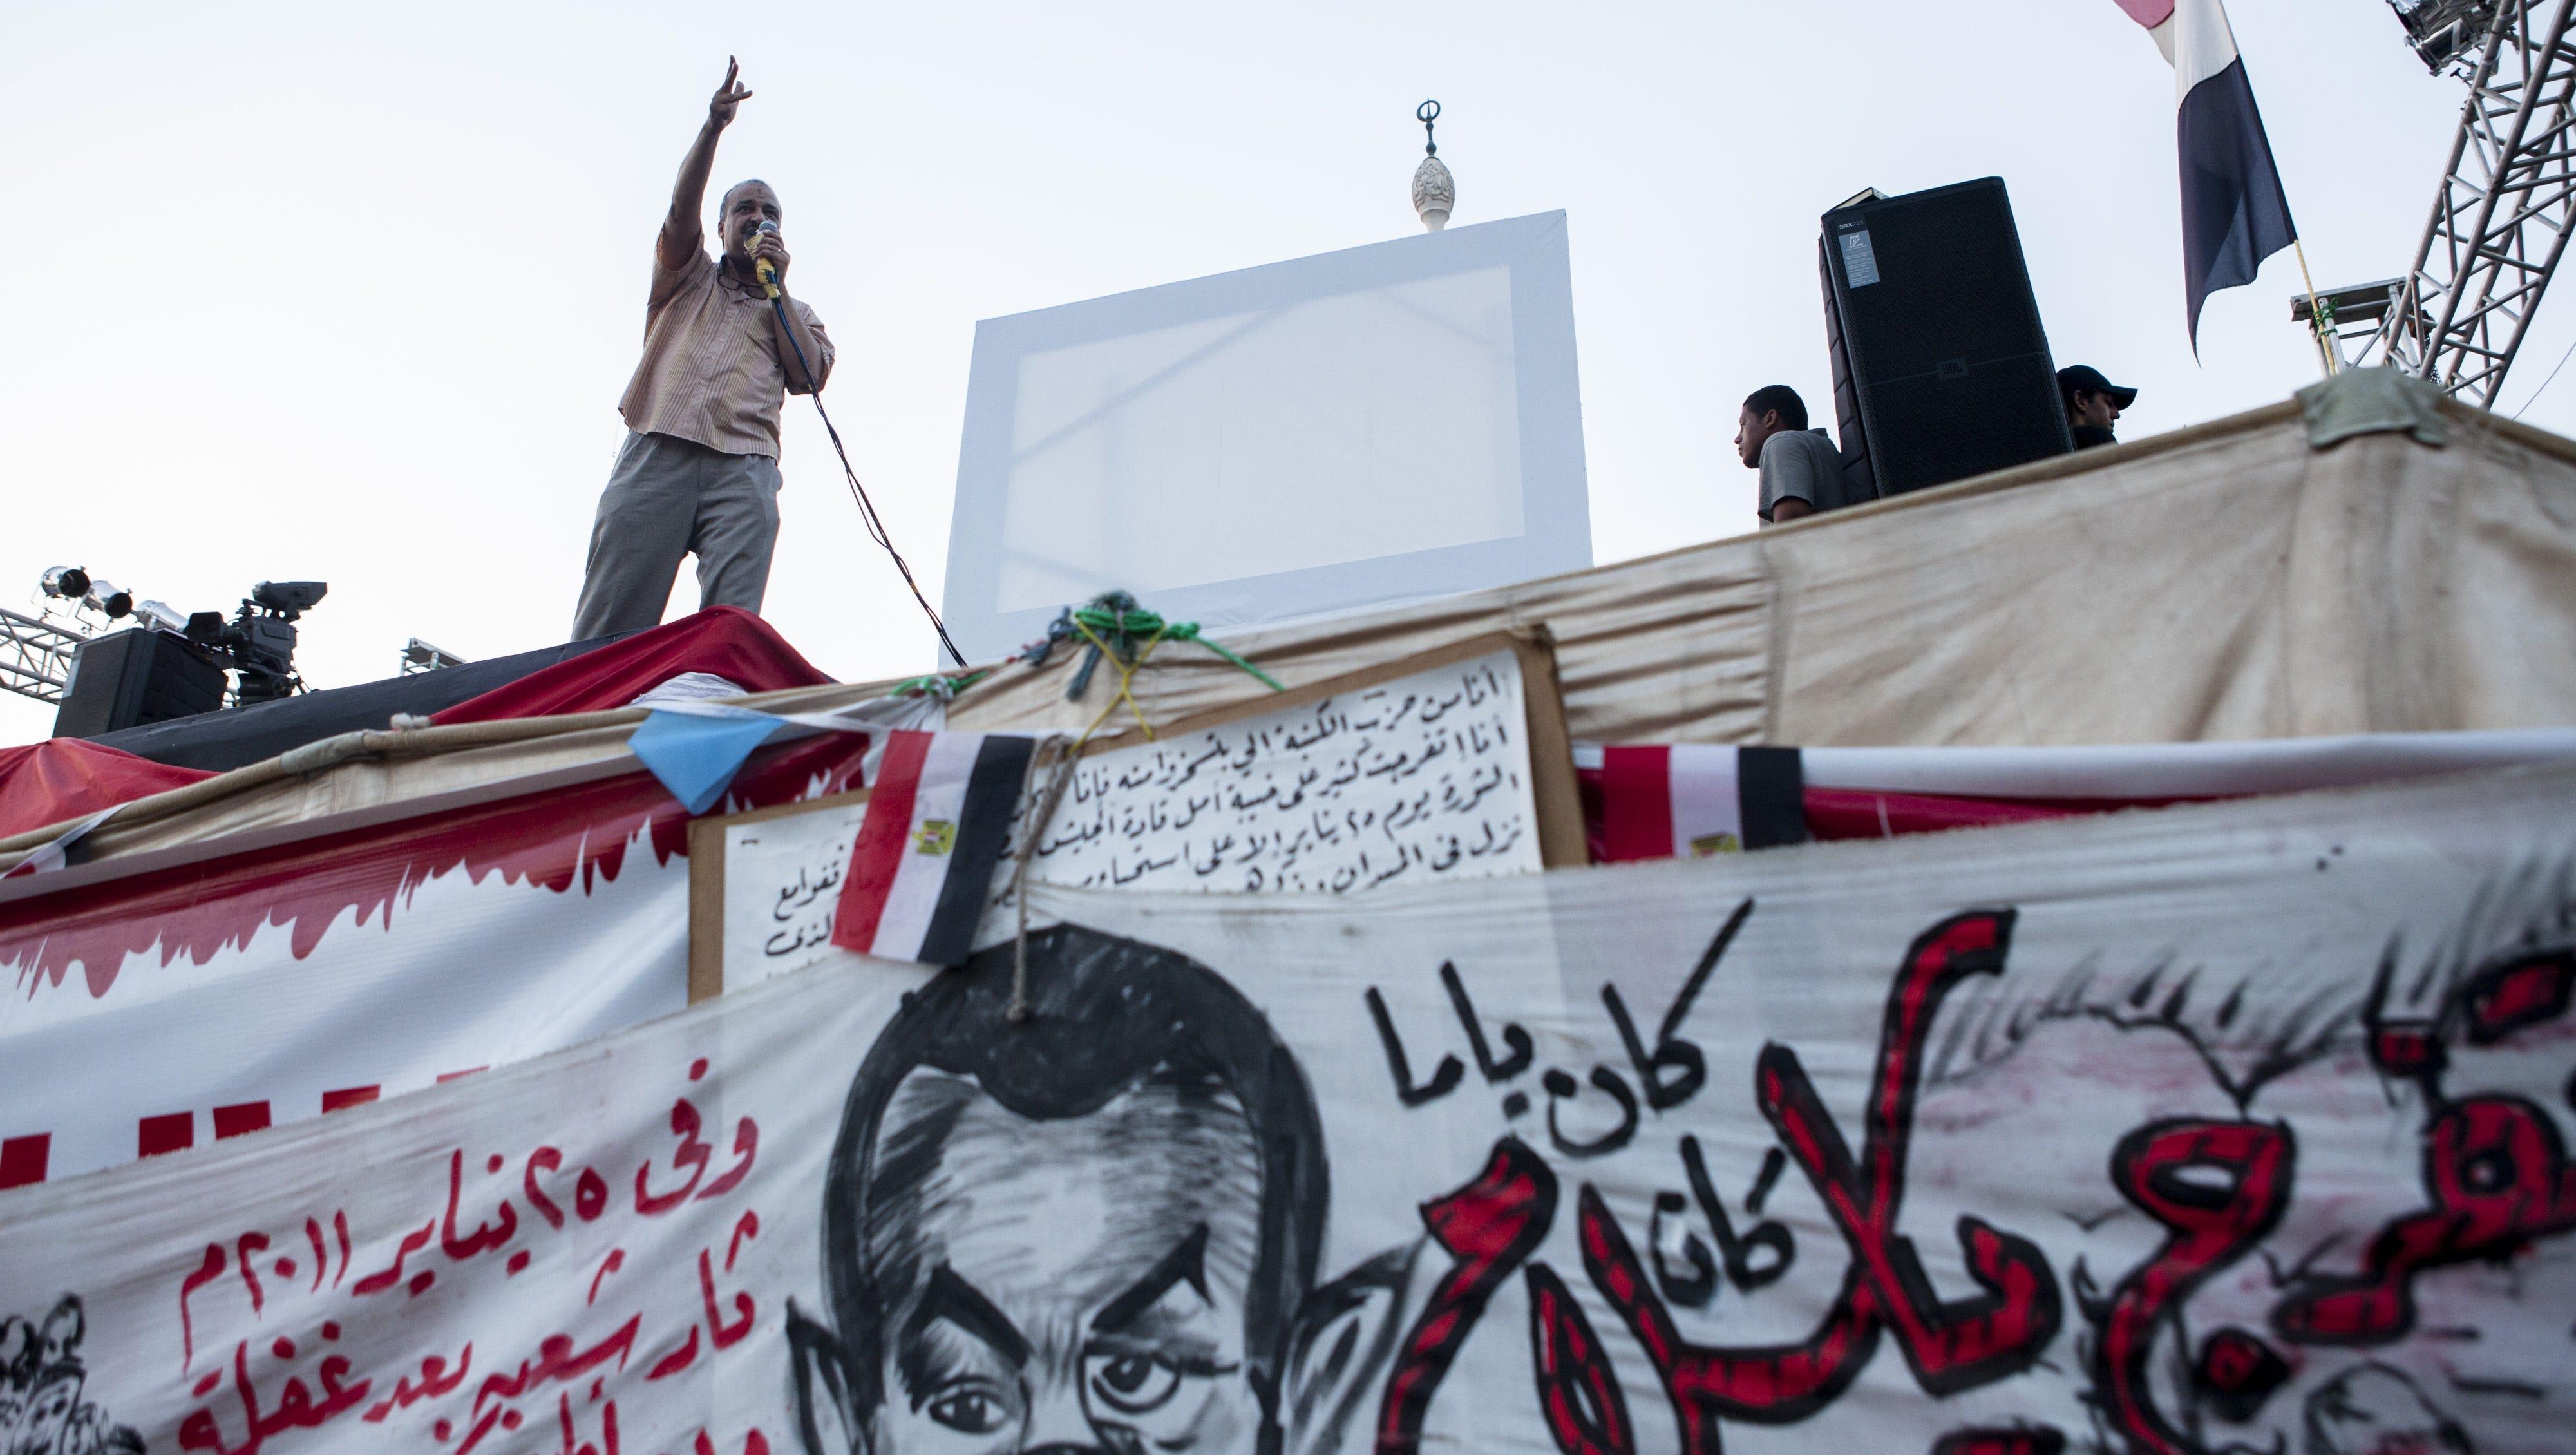 Senior Muslim Brotherhood member Mohammed al-Beltagy addresses Morsi supporters at a sit-in on Aug. 12.